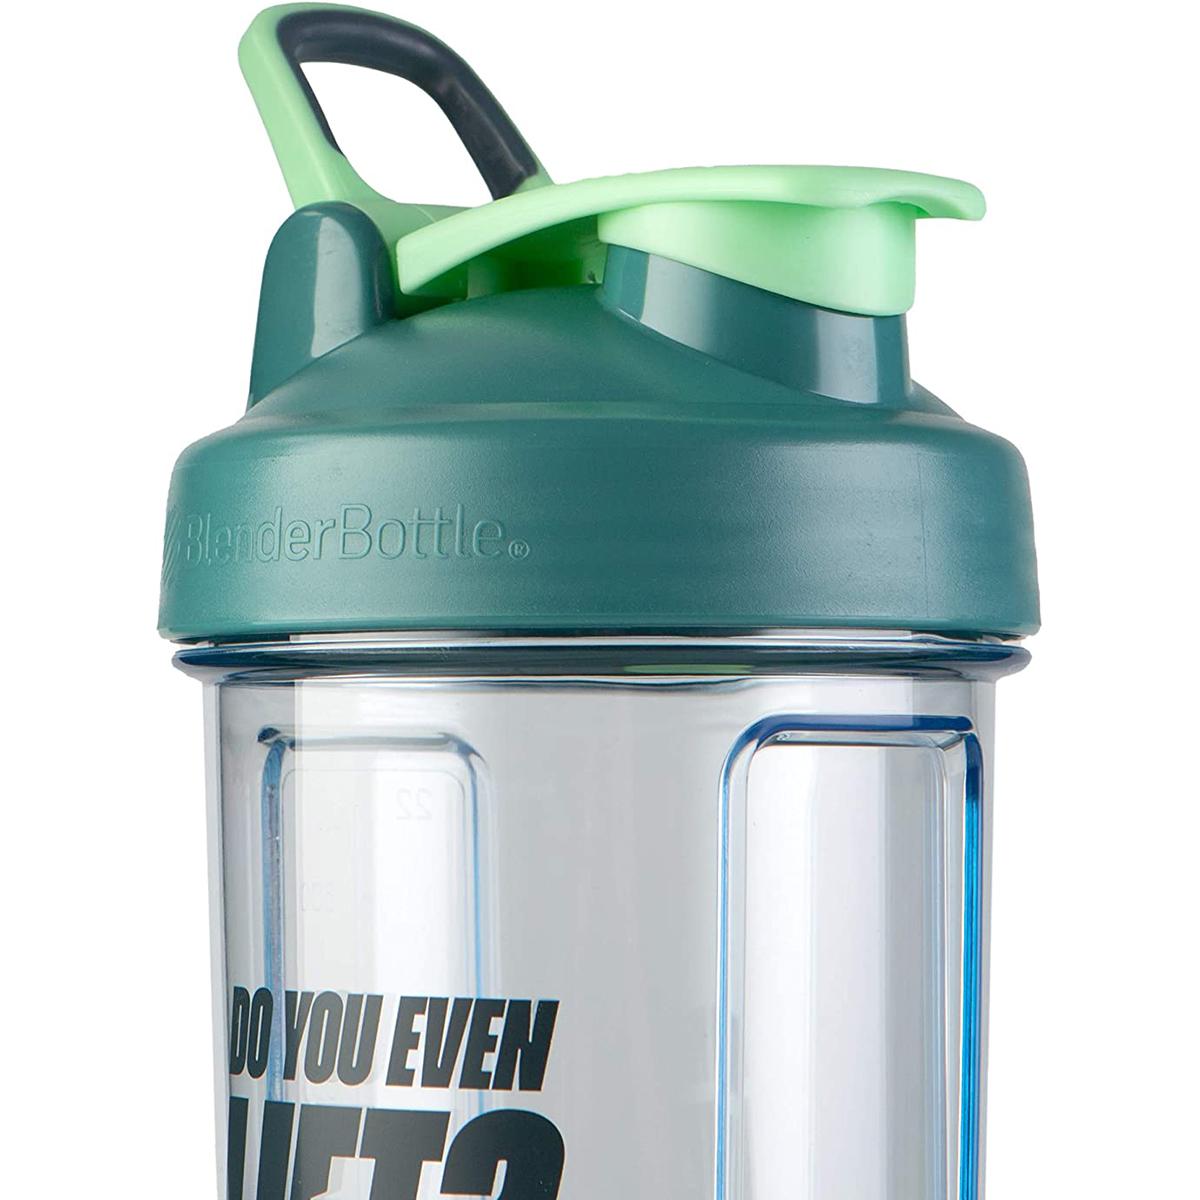 thumbnail 8 - Blender Bottle The Mandalorian Pro Series 28 oz. Shaker Mixer Cup with Loop Top